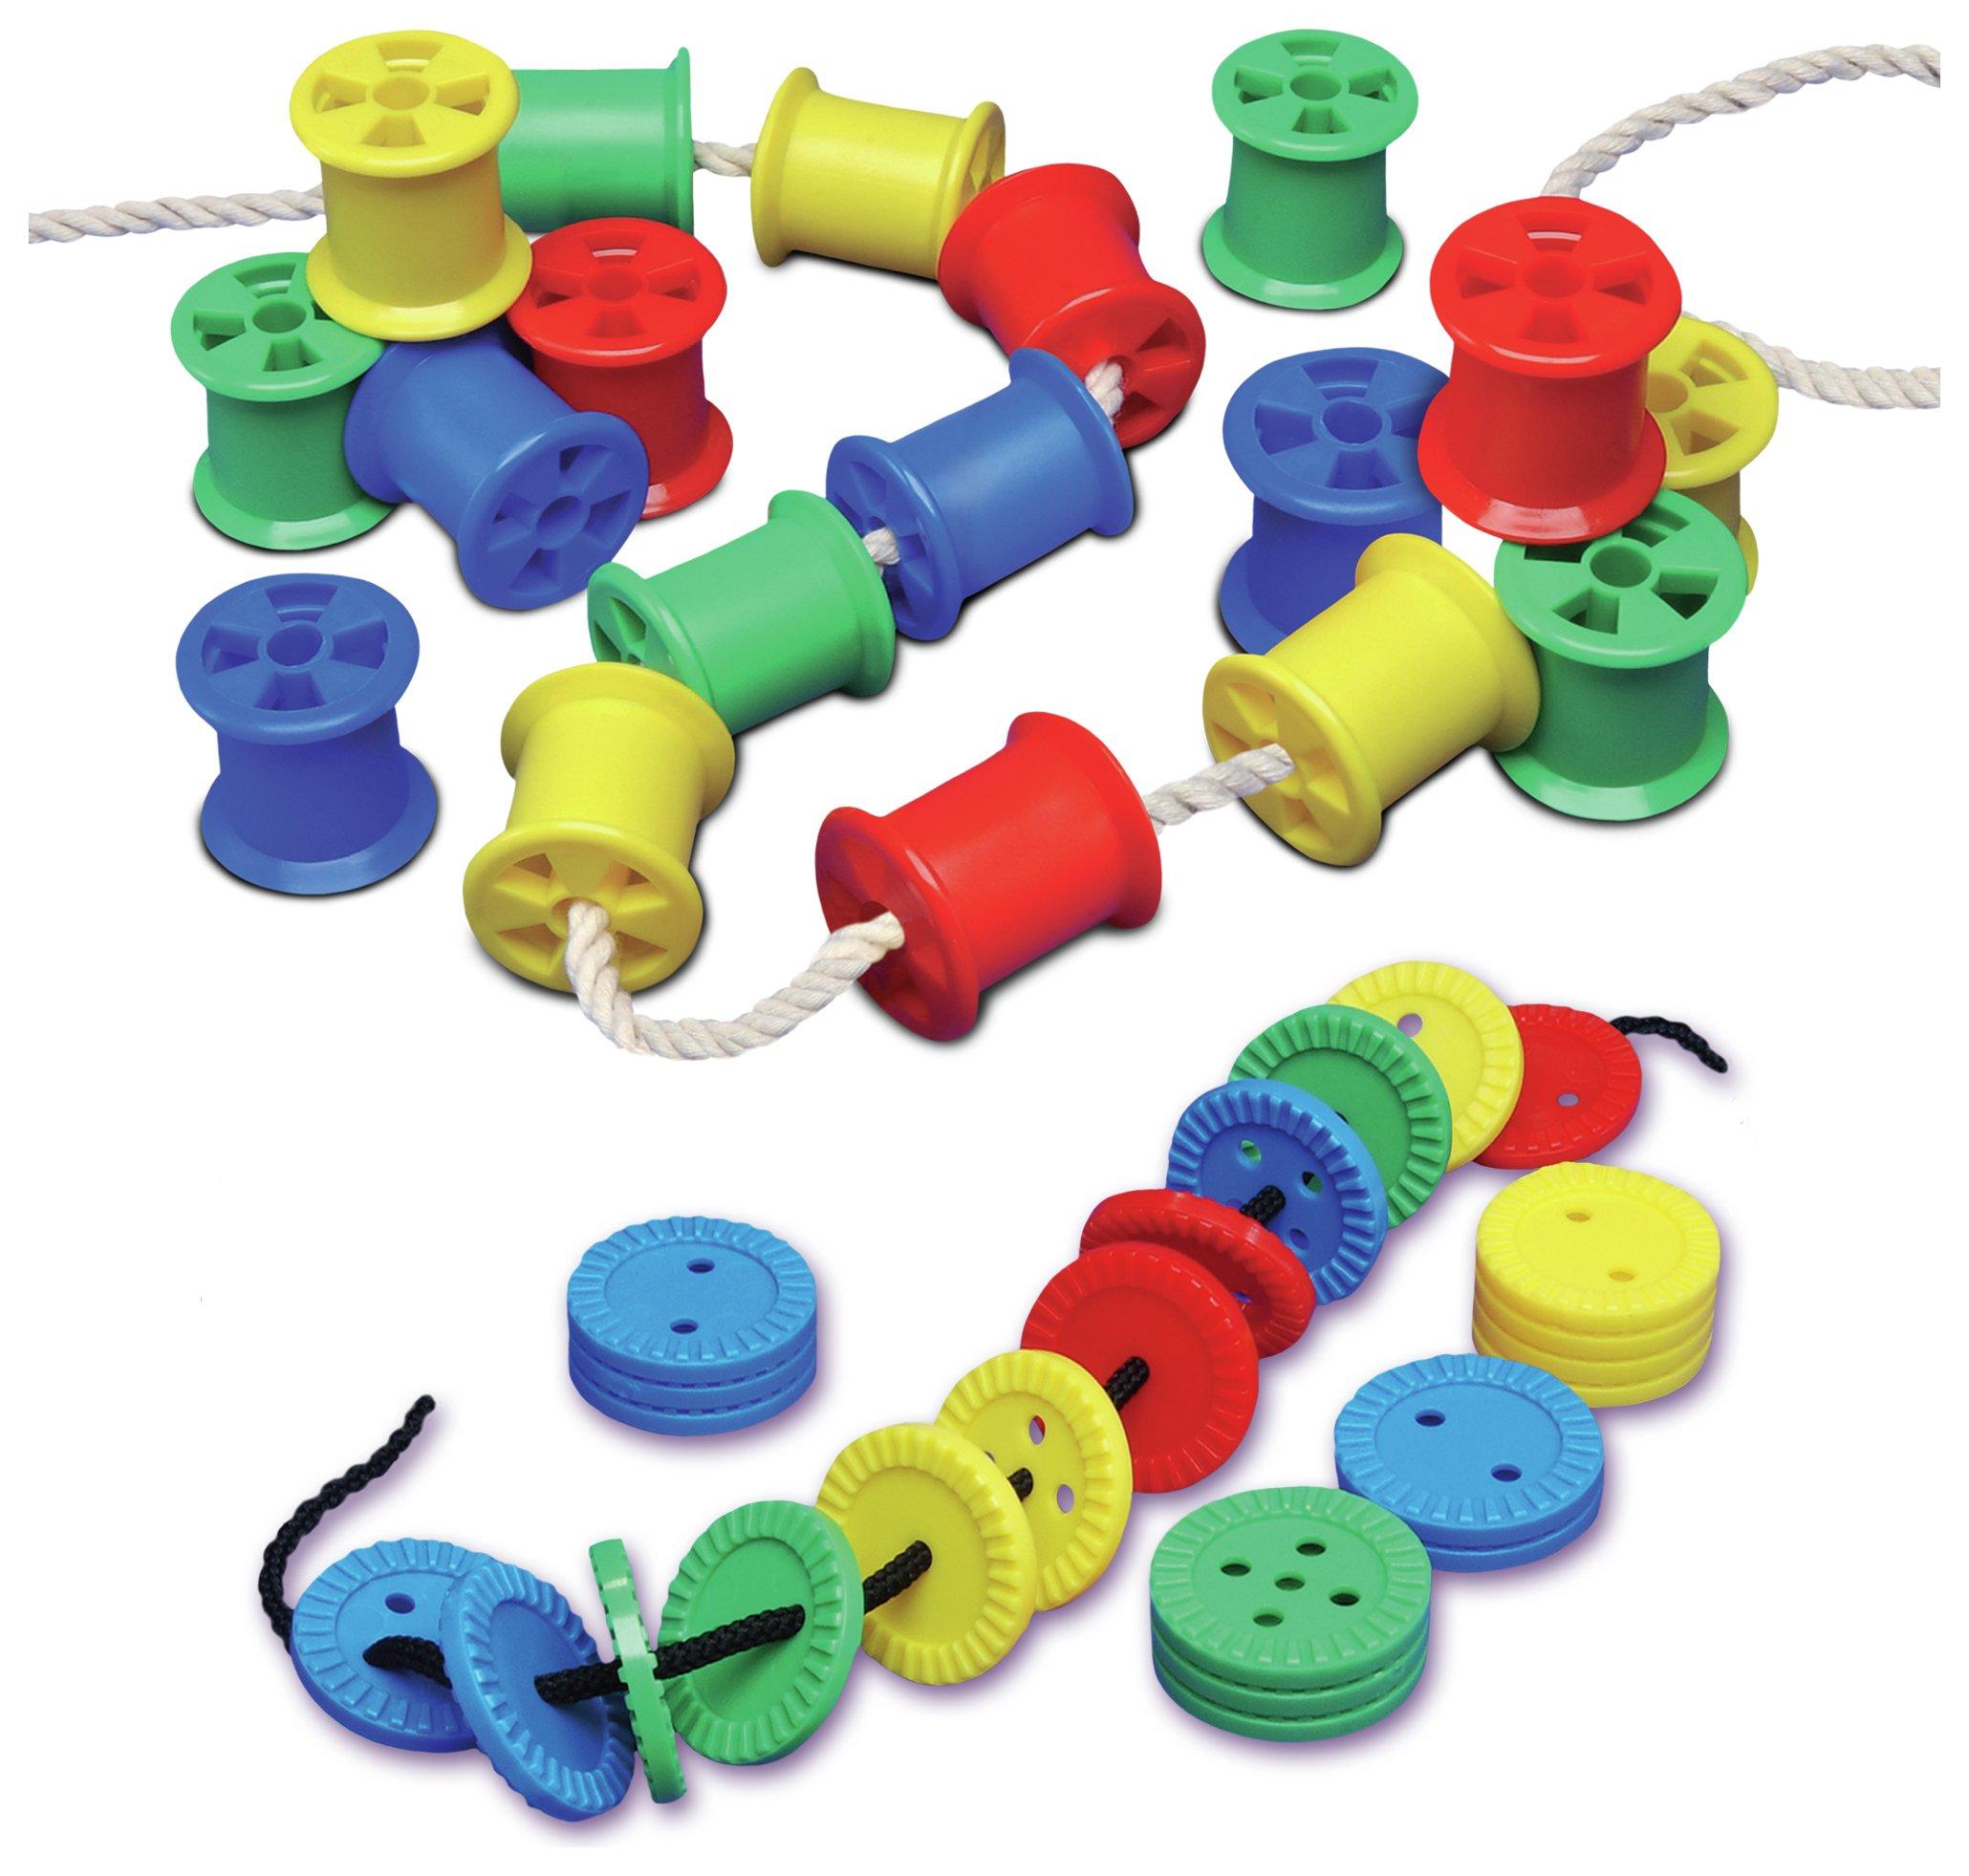 Image of Cotton Reels Fun Buttons Bundle.